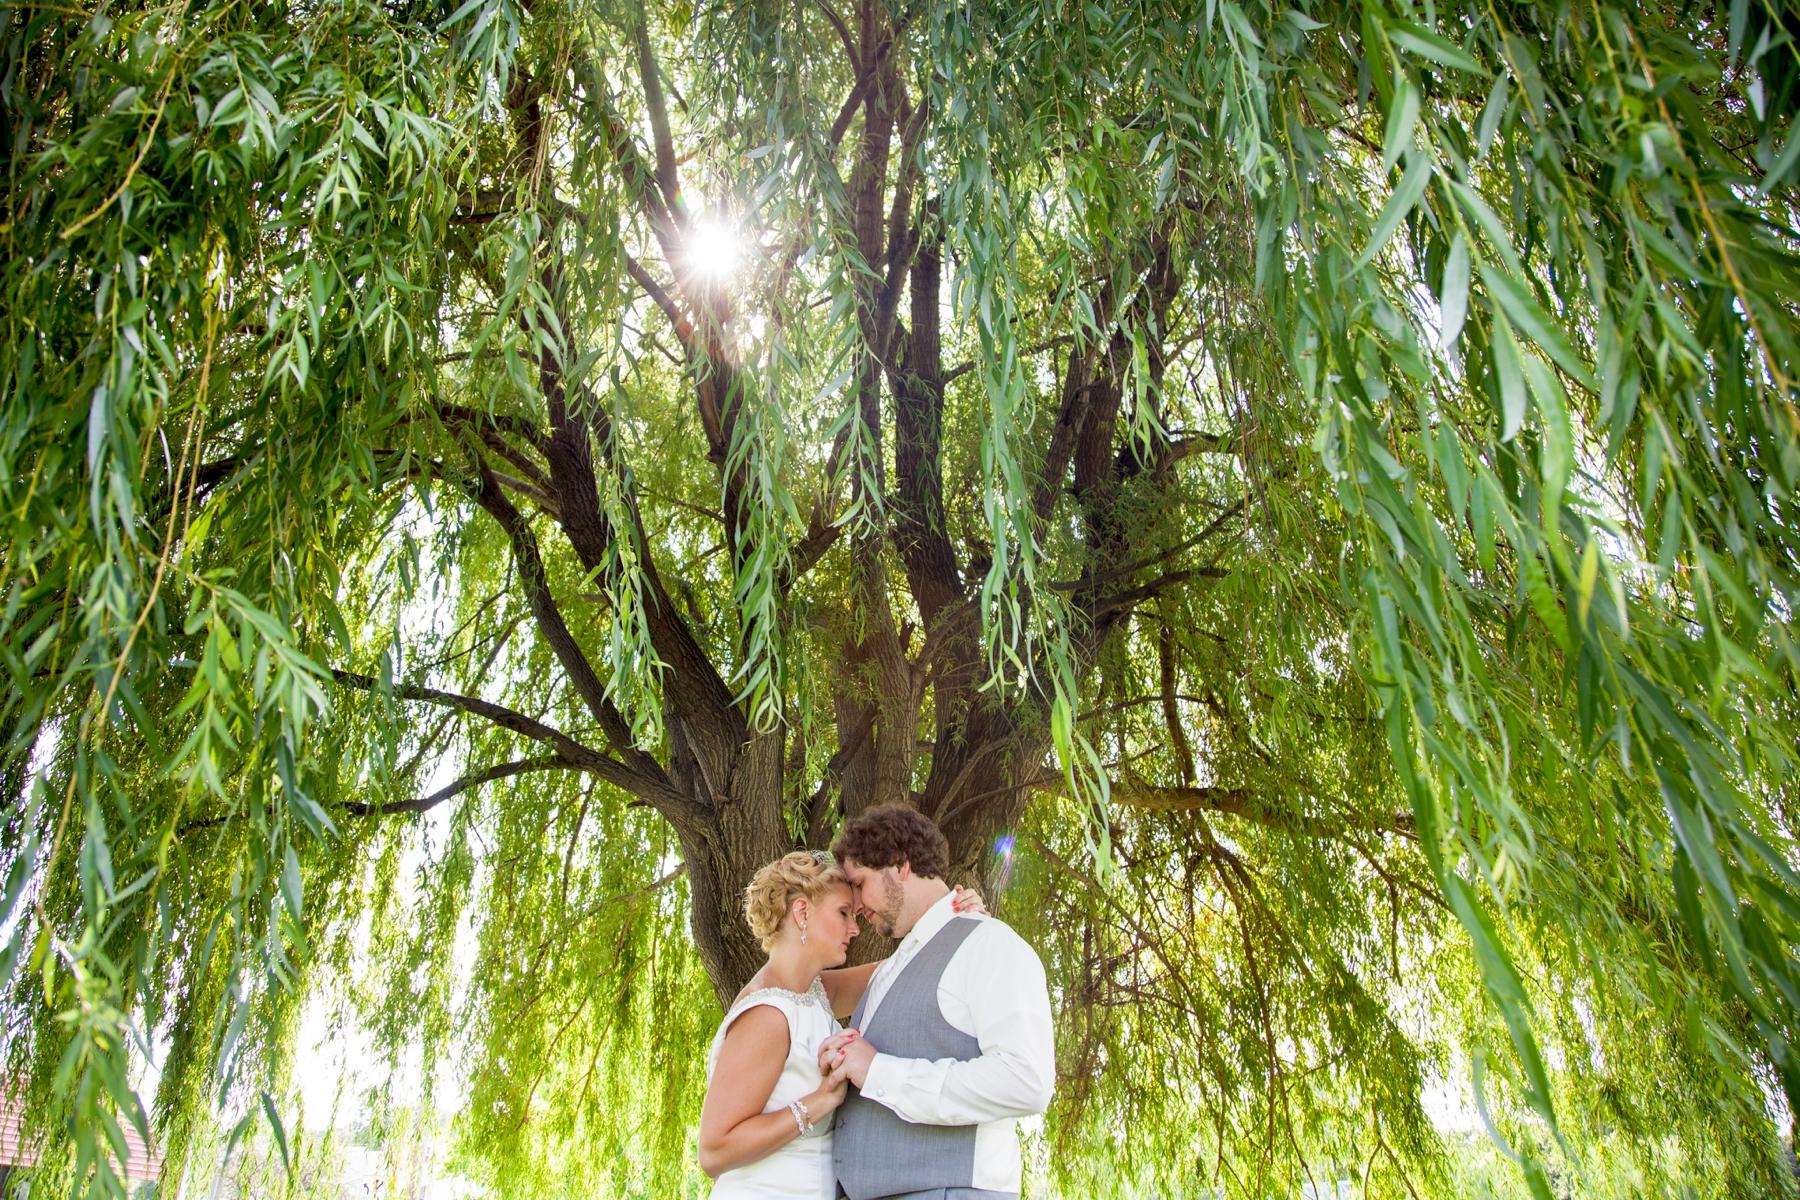 Brandon_Shafer_Photography_Chris_Lauren_Michigan_State_Capital_Wedding_0036.jpg